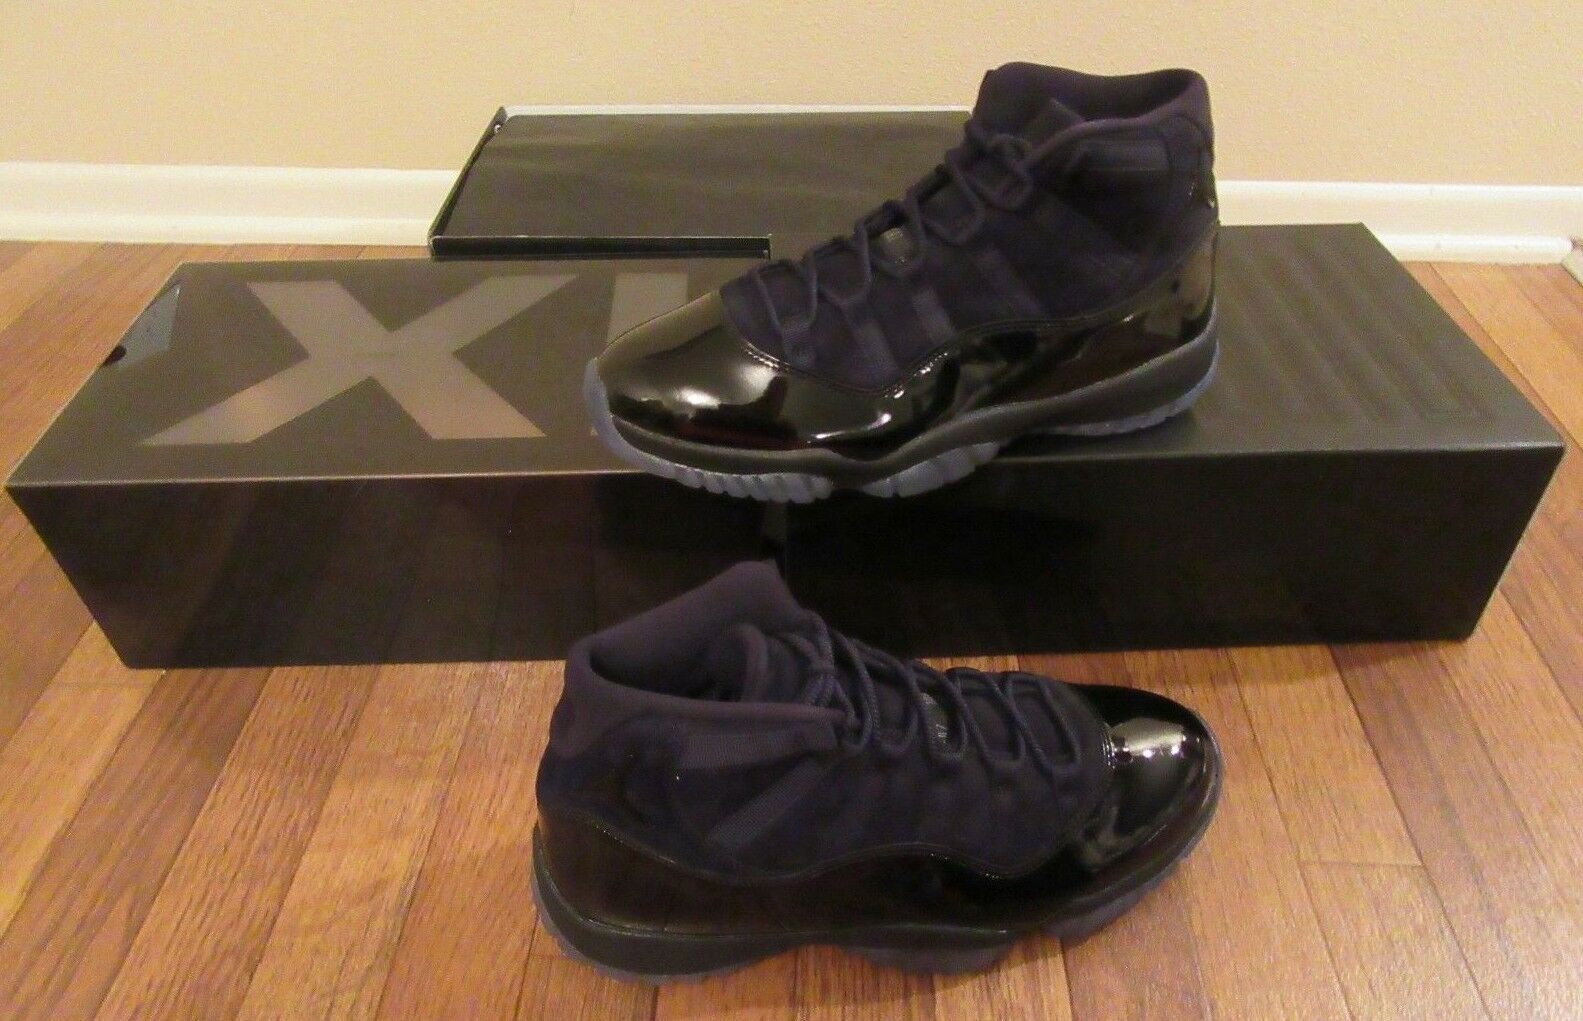 Nike air jordan 11 dimensioni di colore nero retrò xi 378037 005 pac abito pennino